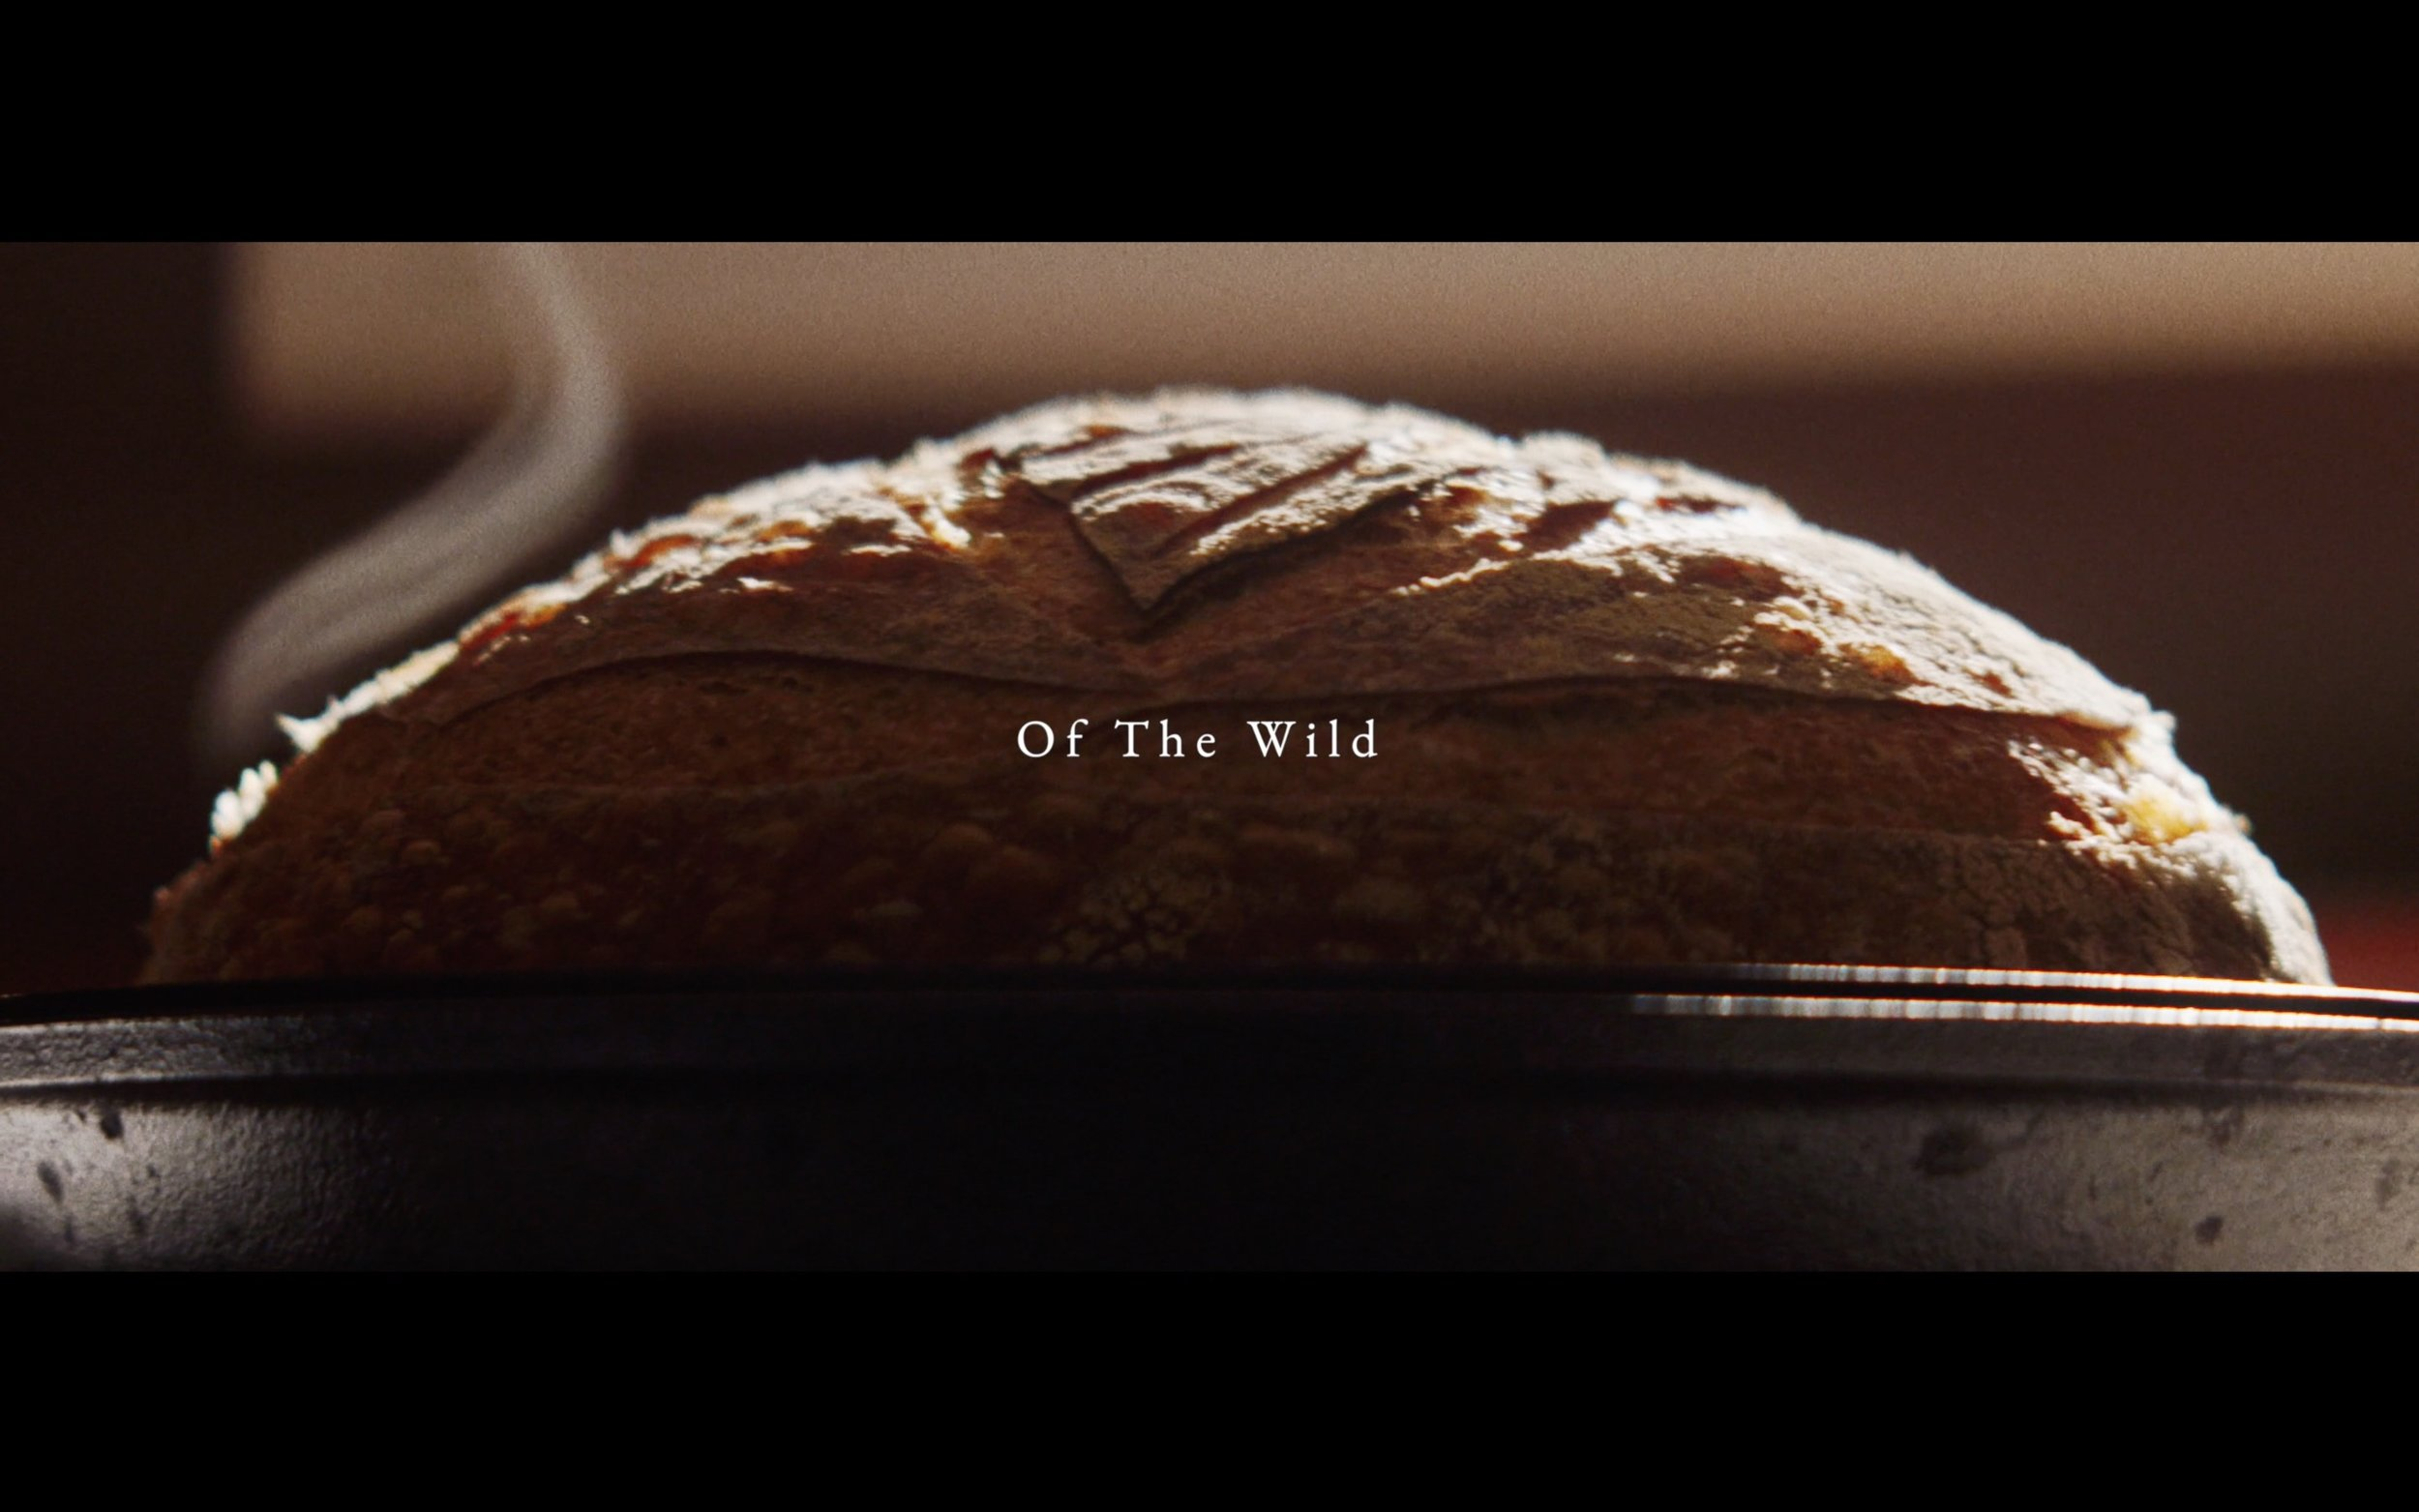 Of the Wild_Junko Mine_Food Talkies_James Beard_Andrew Gooi_001.jpg